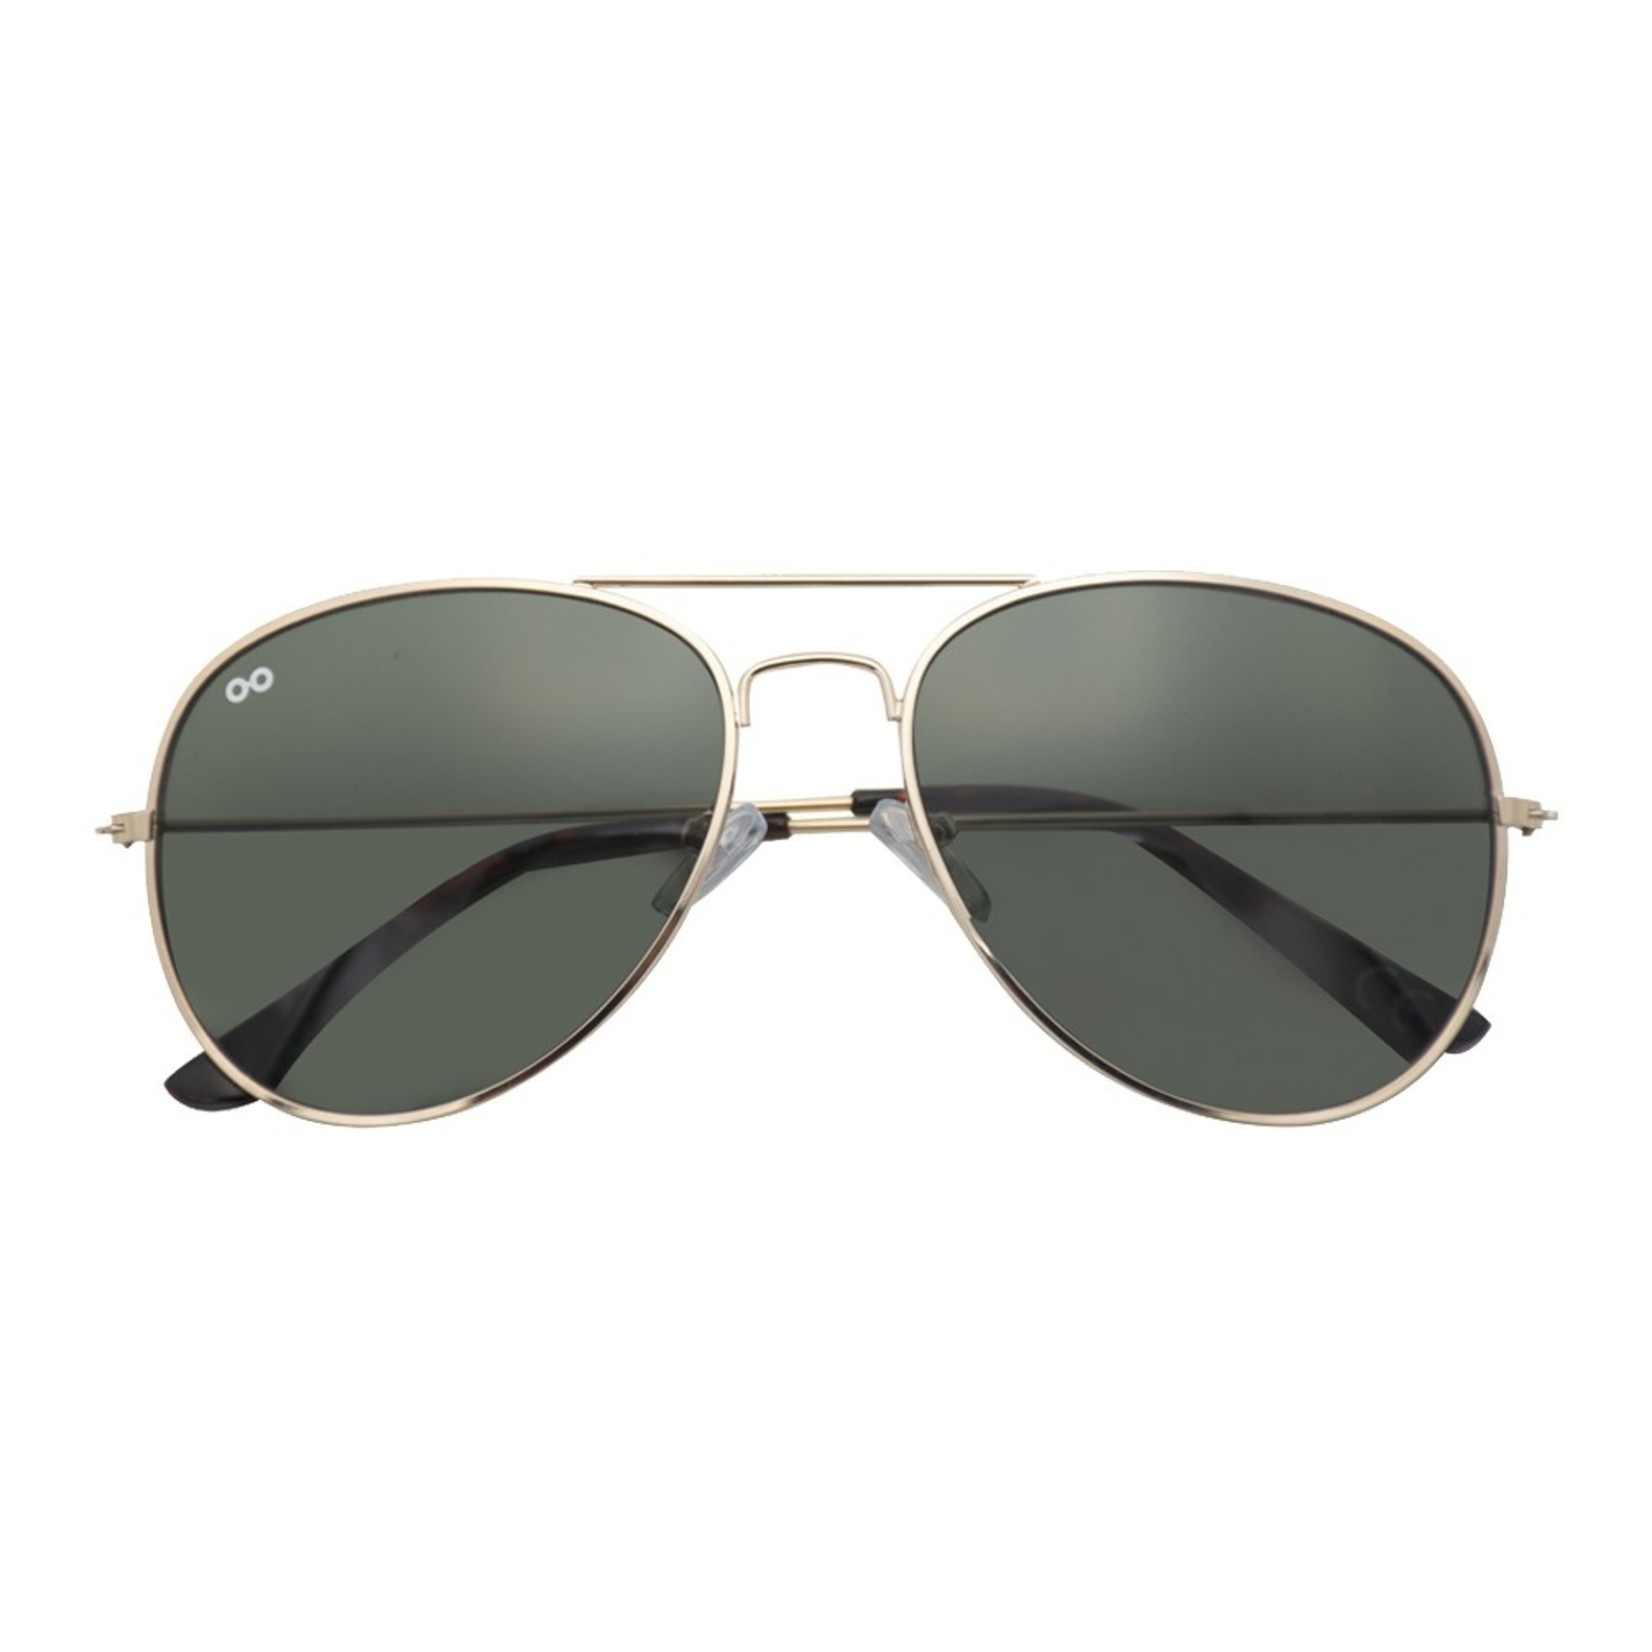 Croon Scott Shiny Gold/Green zonnebril pilotenbril